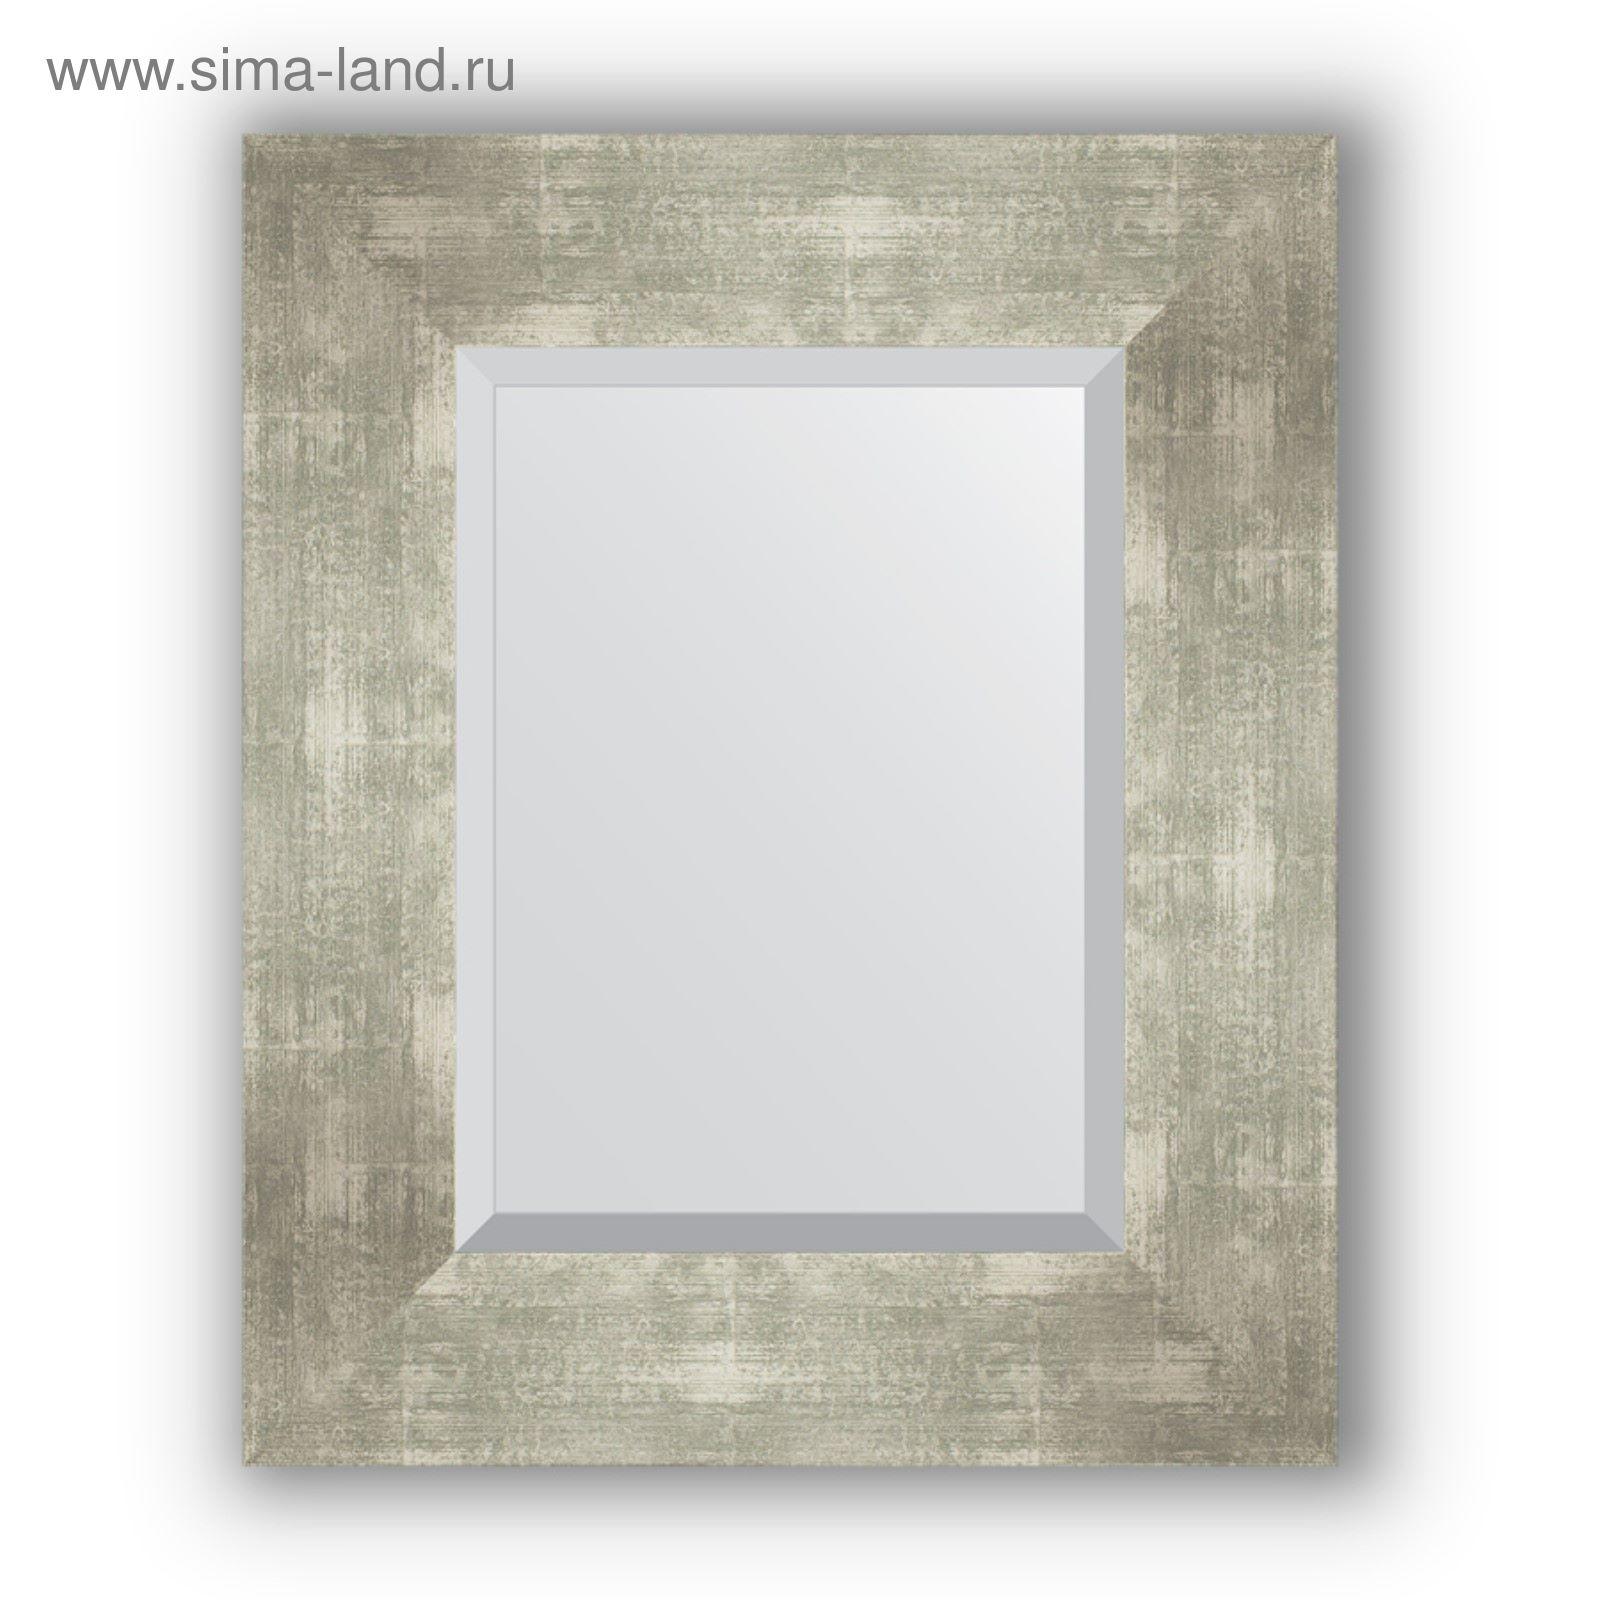 773a56f409da Зеркало с фацетом в багетной раме - алюминий 90 мм, 46 х 56 см ...